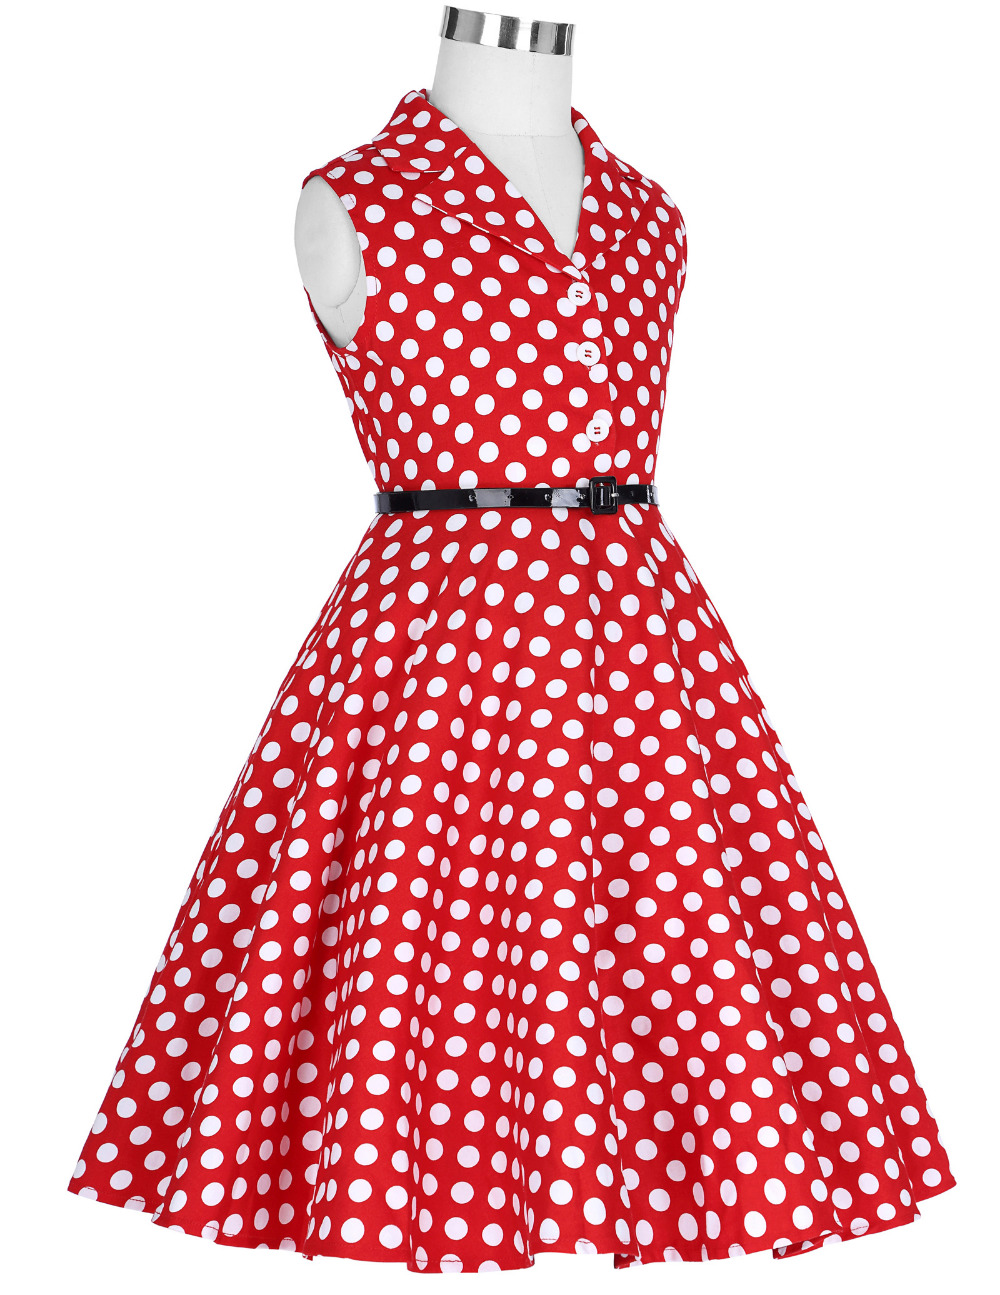 Grace Karin Flower Girl Dresses for Weddings 2017 Sleeveless Polka Dots Printed Vintage Pin Up Style Children's Clothing 16